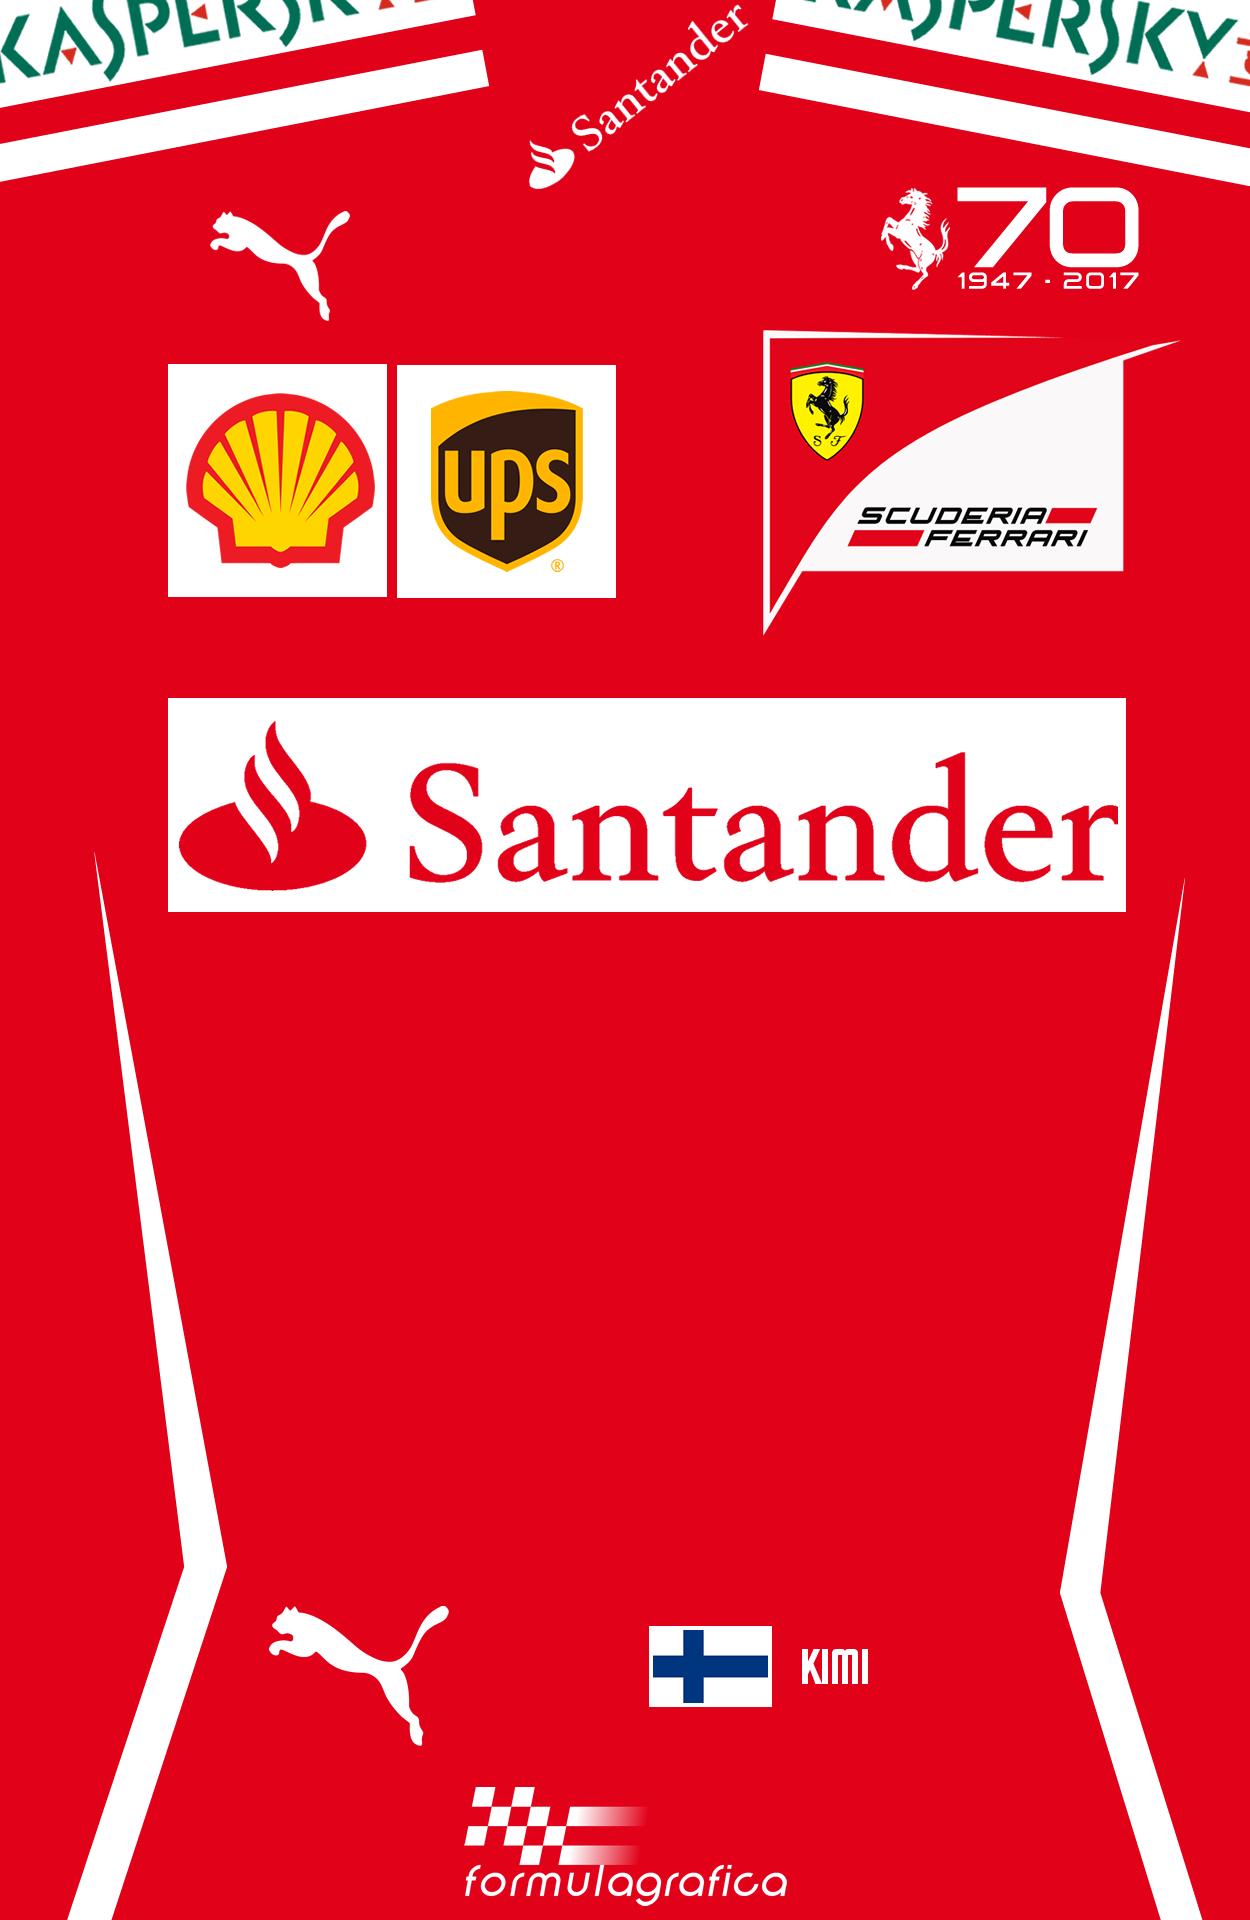 Scuderia Ferrari Scuderia Ferrari For Iphone 1250x1920 Download Hd Wallpaper Wallpapertip